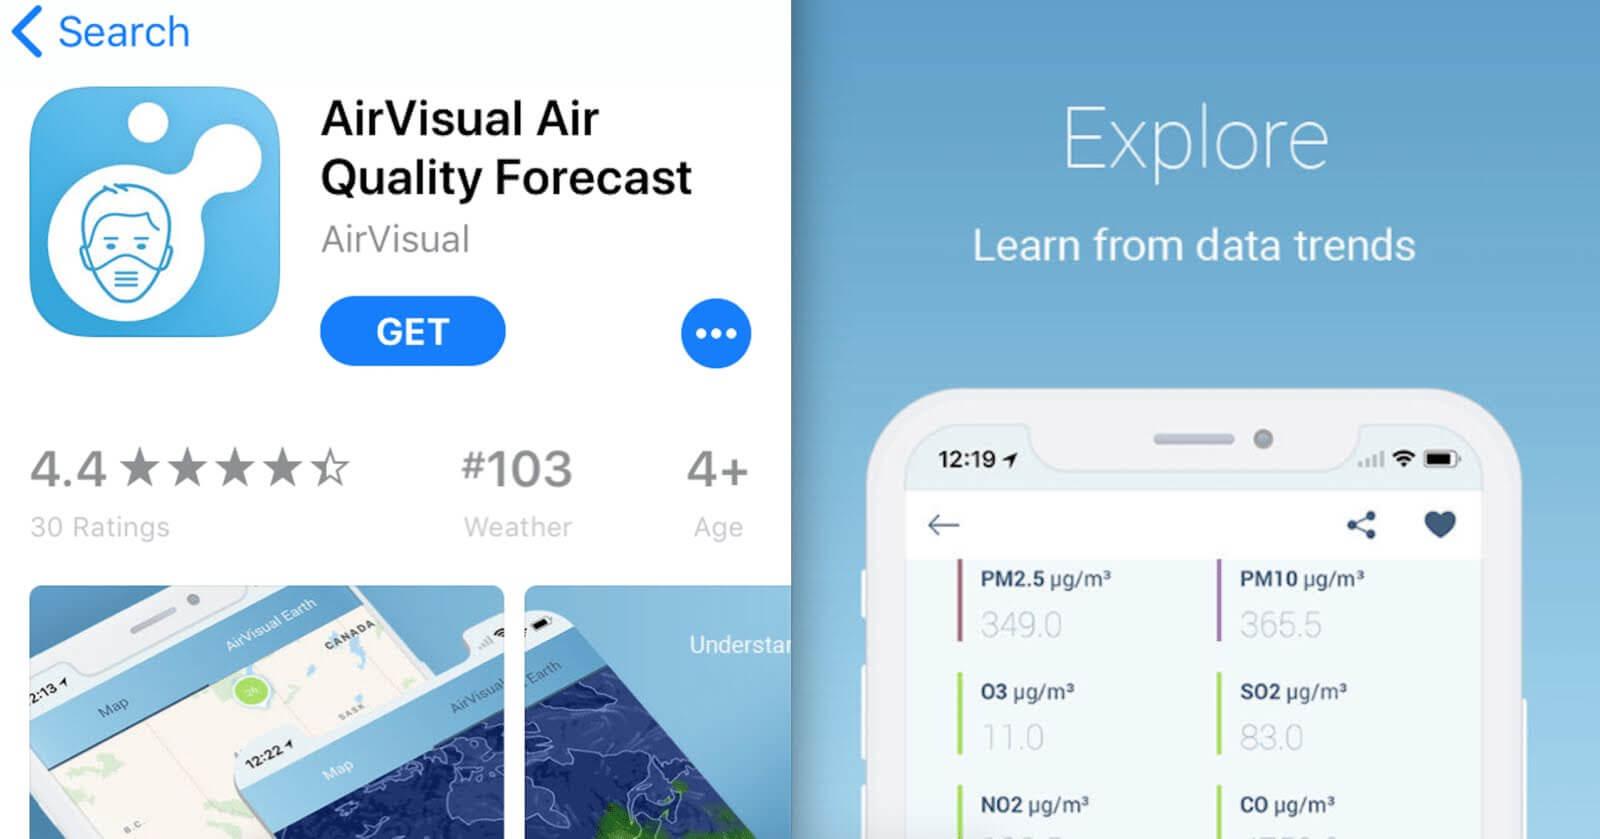 AirVisual Air Quality